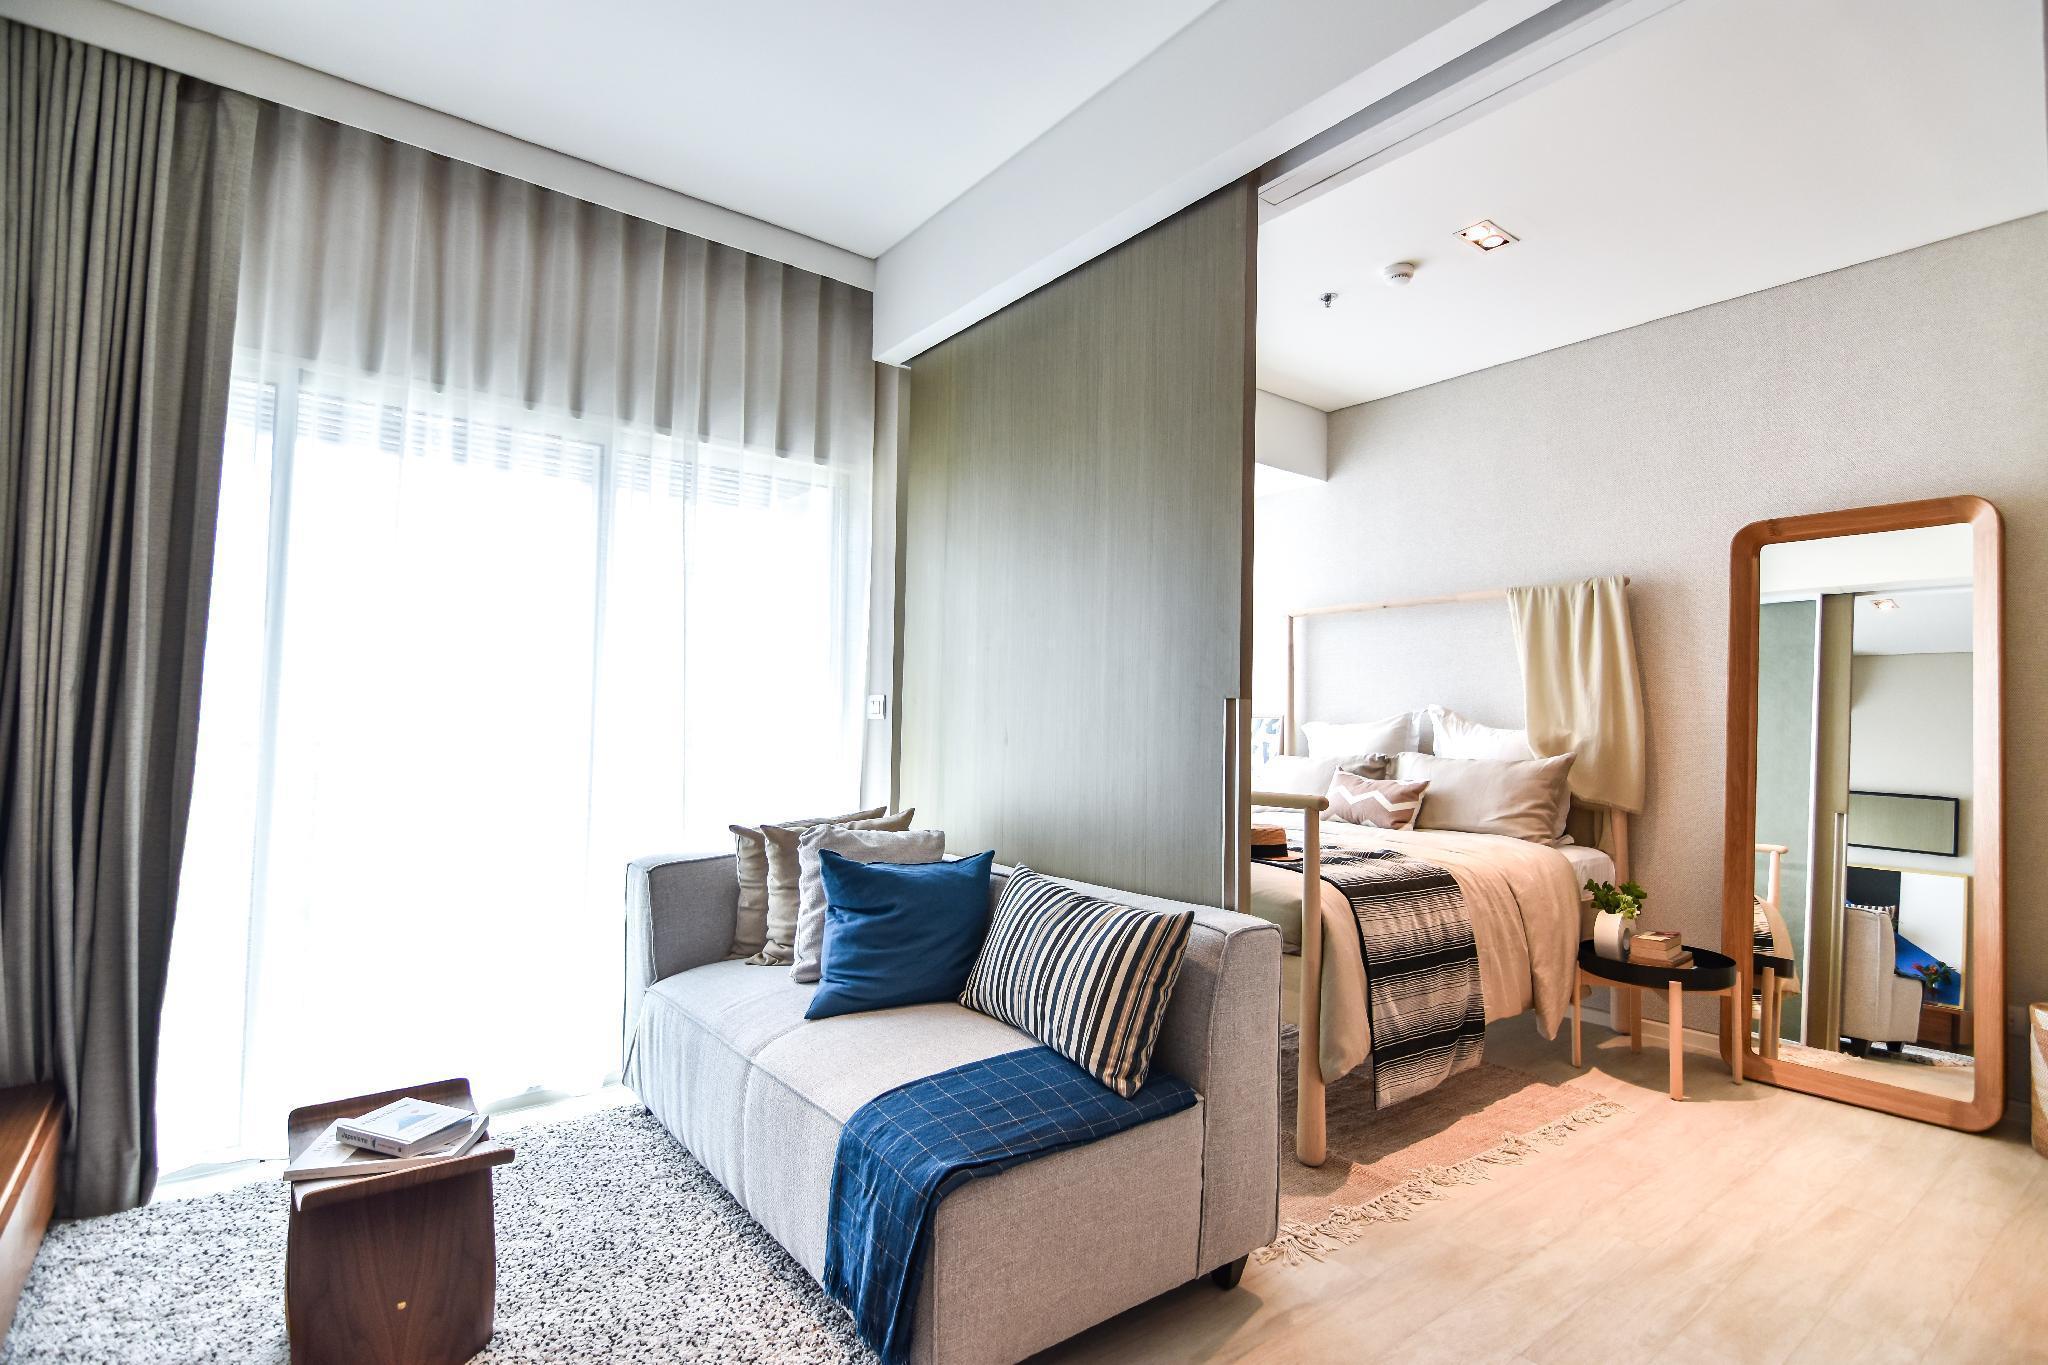 Veranda Residence by Pattaya Holiday เวรันดา เรสซิเดนซ์ บาย พัทยา ฮอลิเดย์